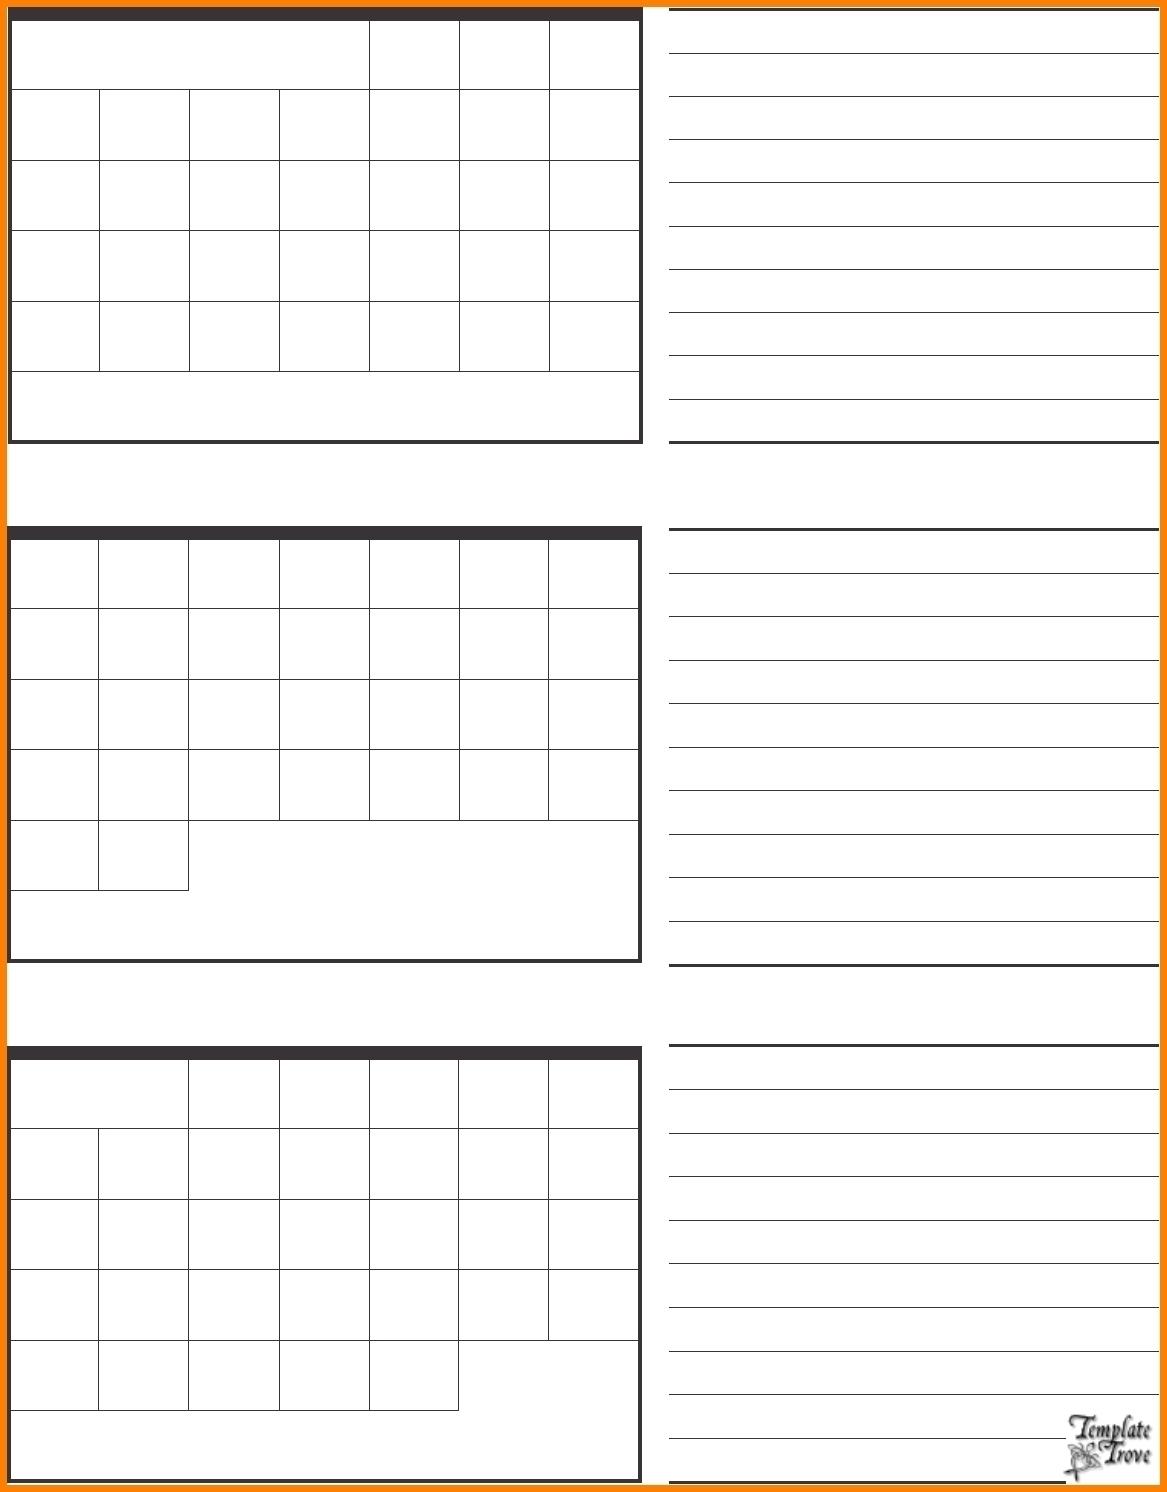 Free 3 Month Calendar Templates   Template Calendar Printable with regard to Free 3 Month Calendar Templates